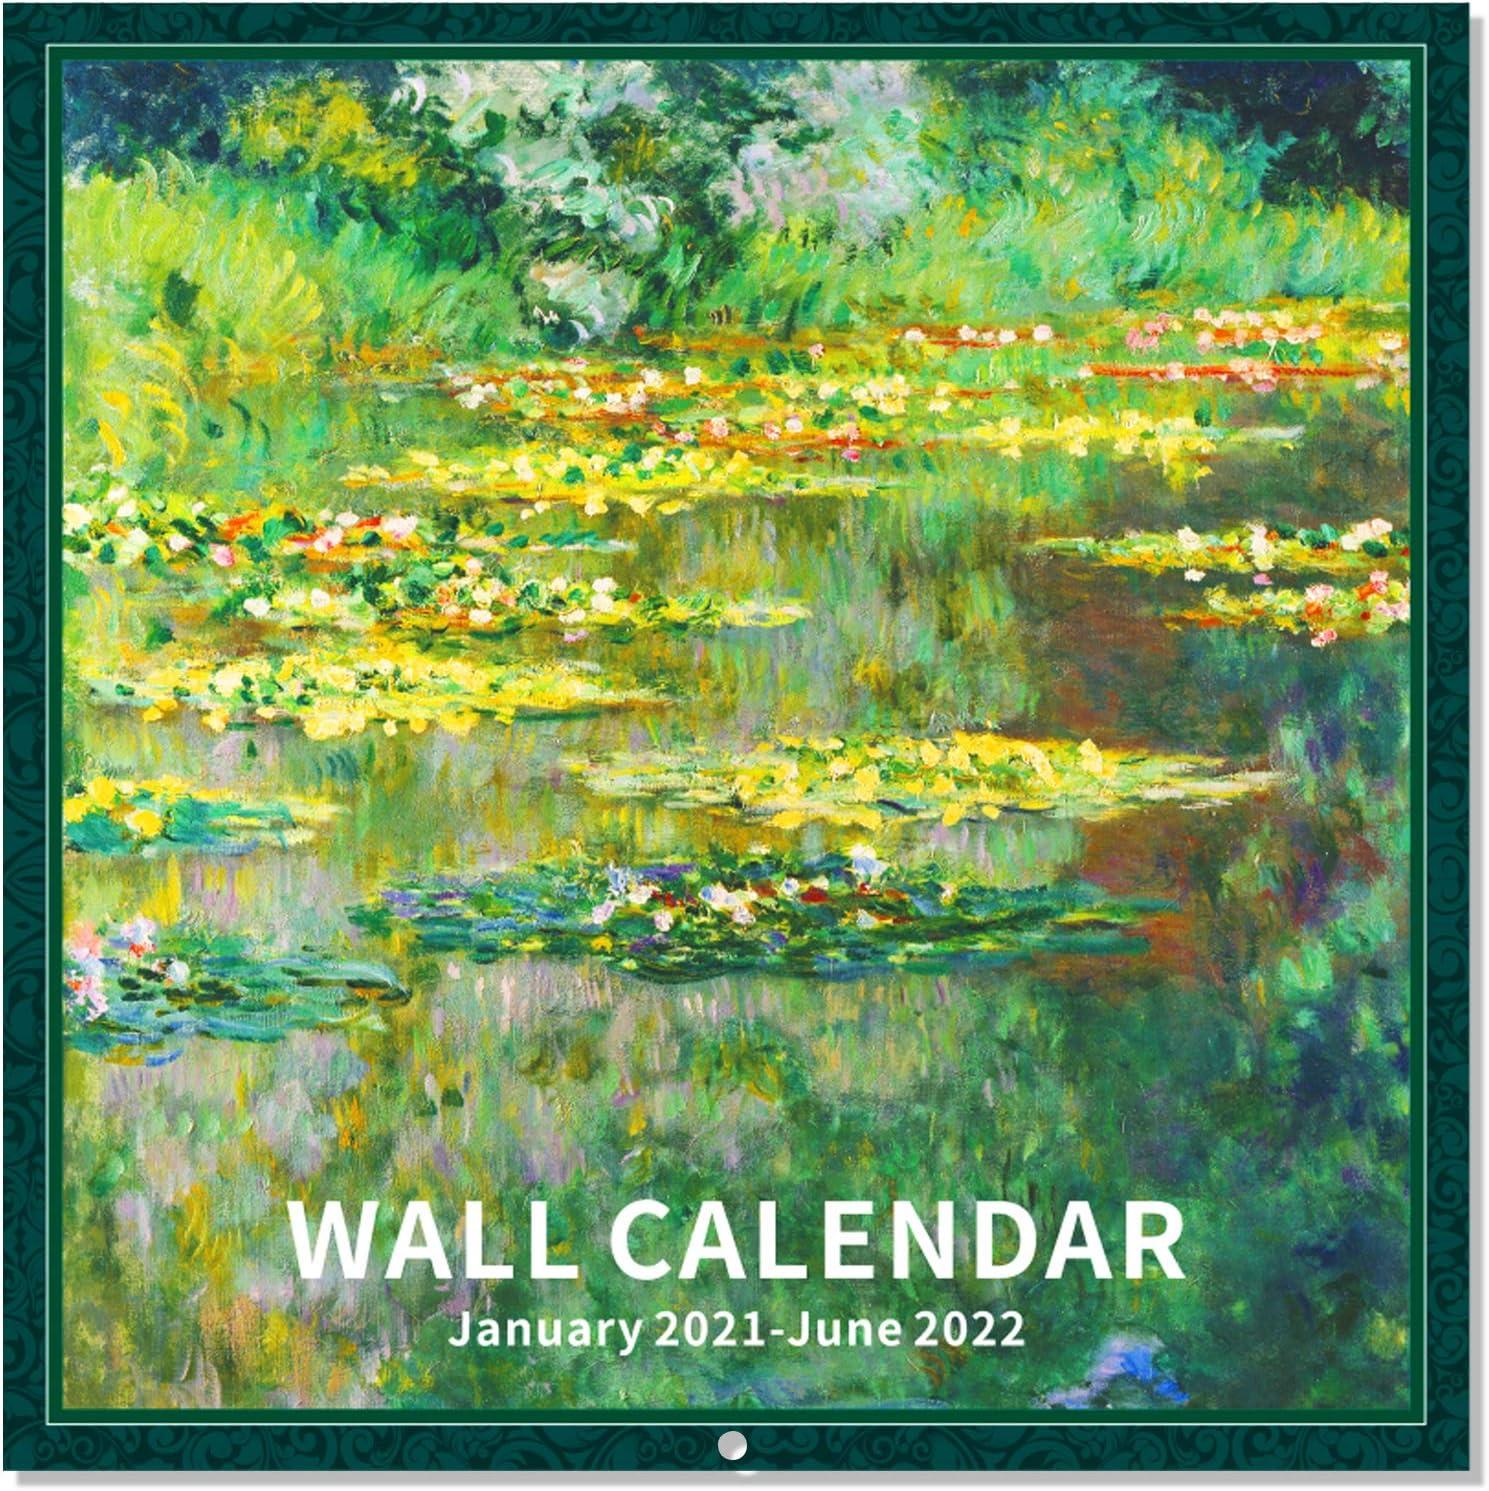 Calendario de pared 2021-30 x 30 cent/ímetros Mensual Vista incluye 180 etiquetas en In Autom/óvil Theme con famosos coches de lujo de 16 meses